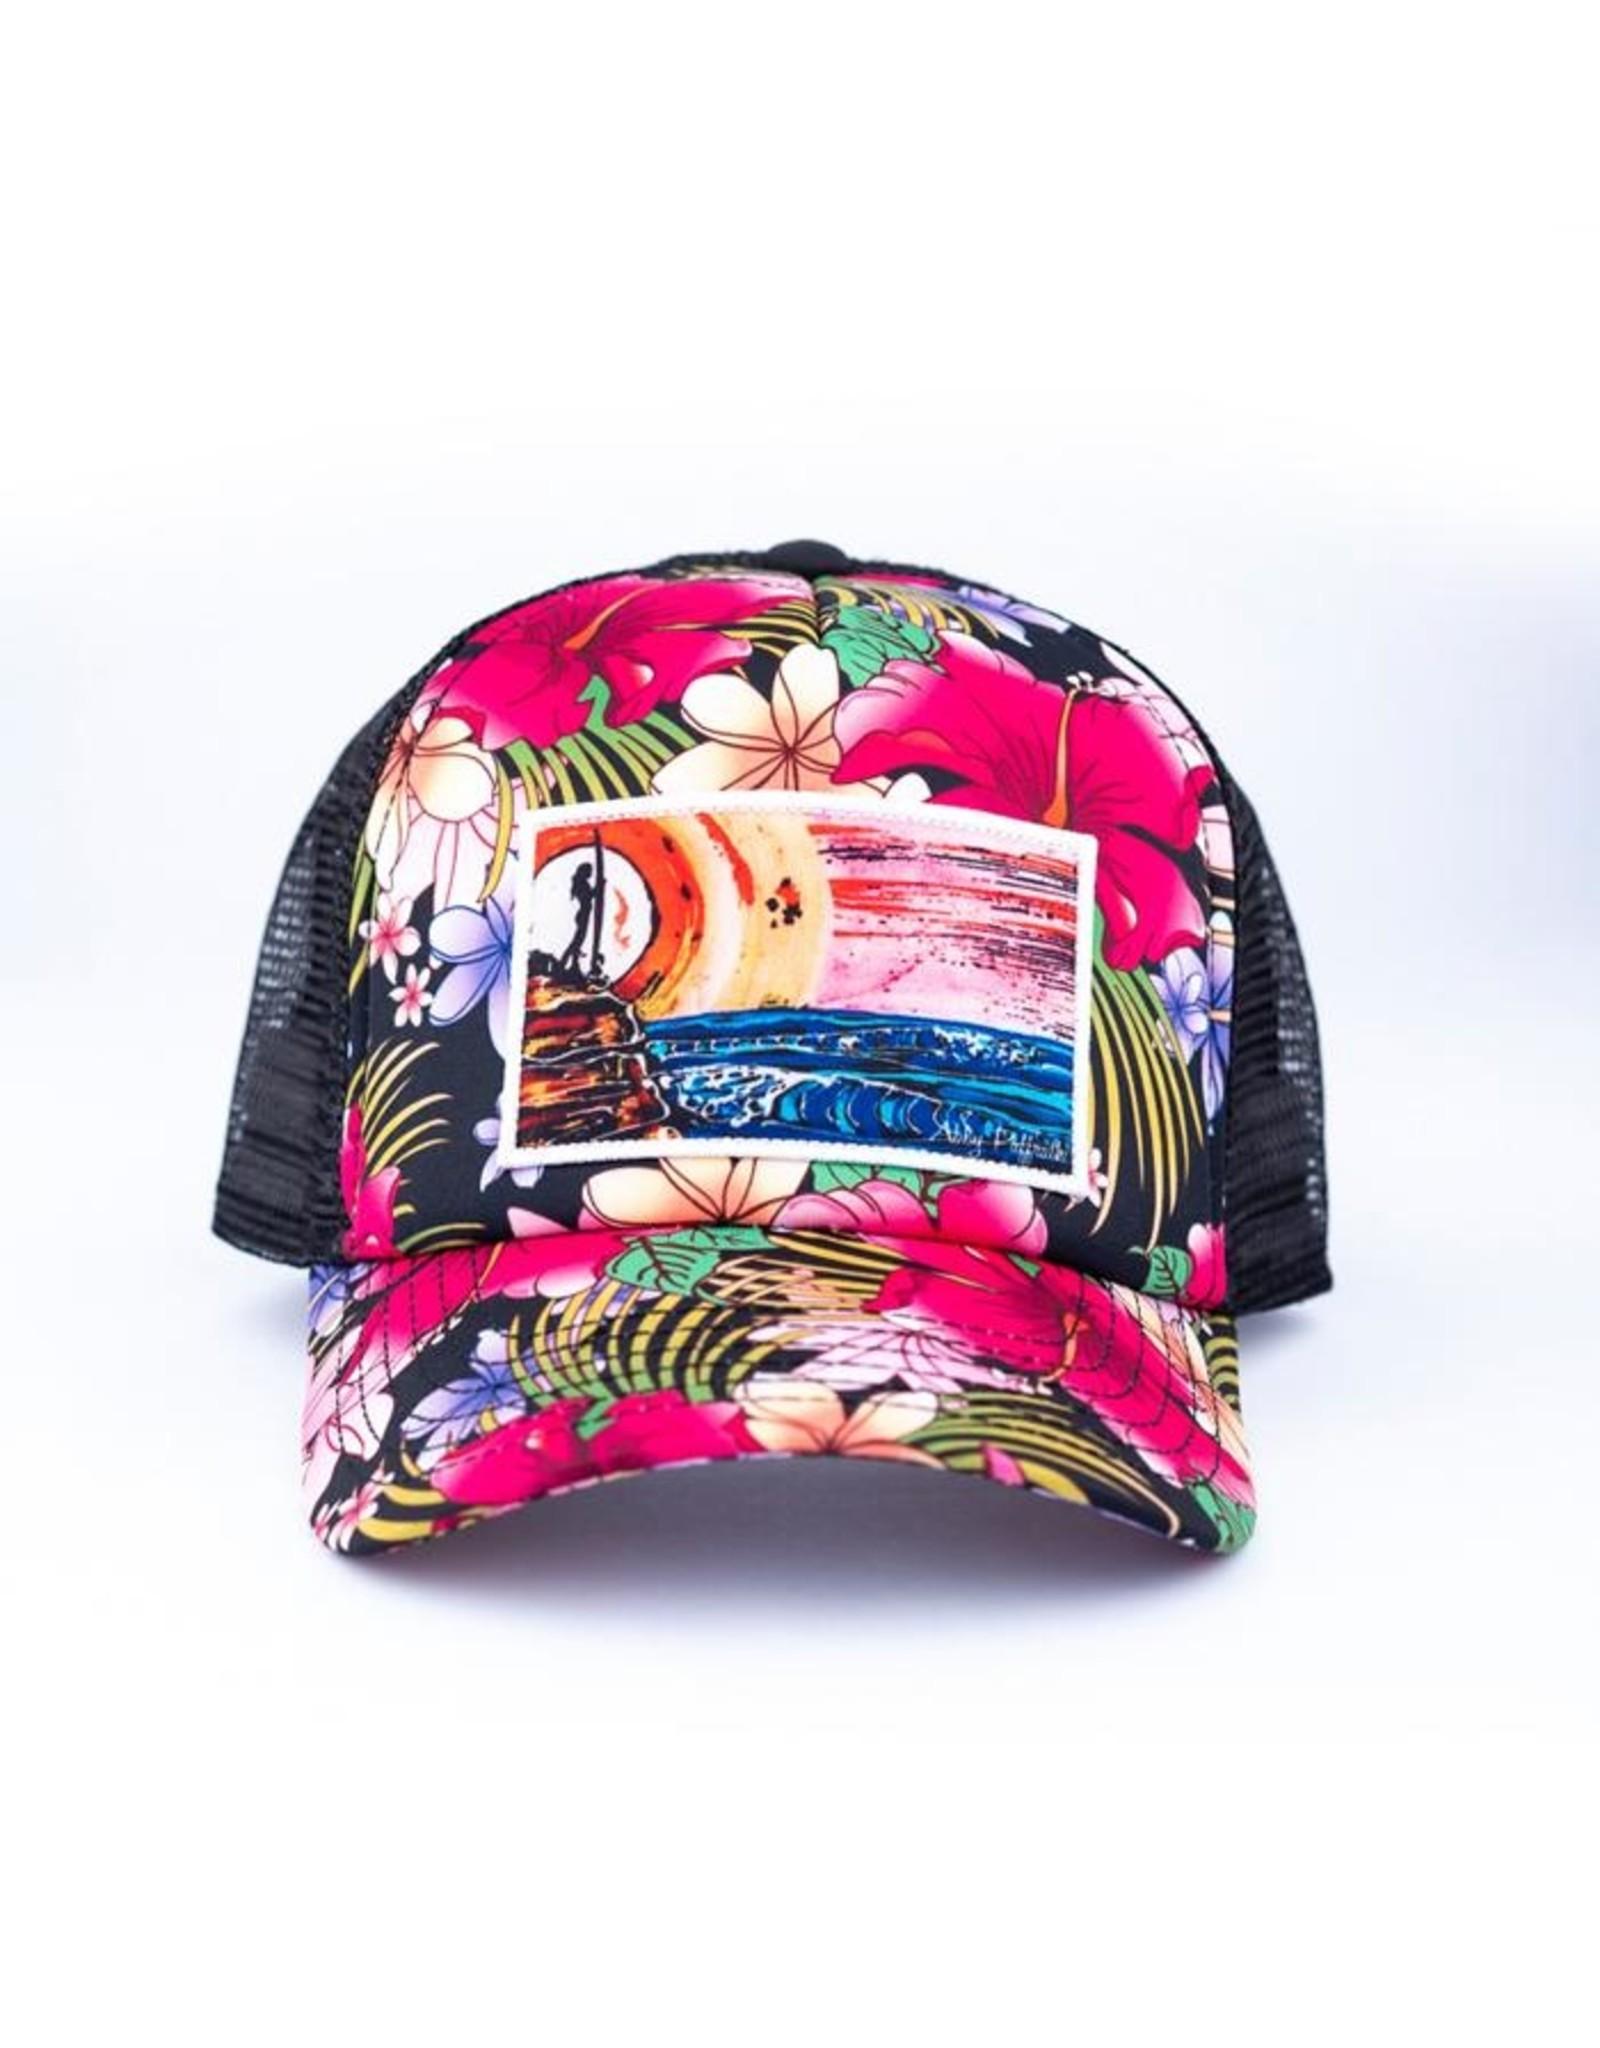 Art 4 All Art 4 All - Island Girl Hat